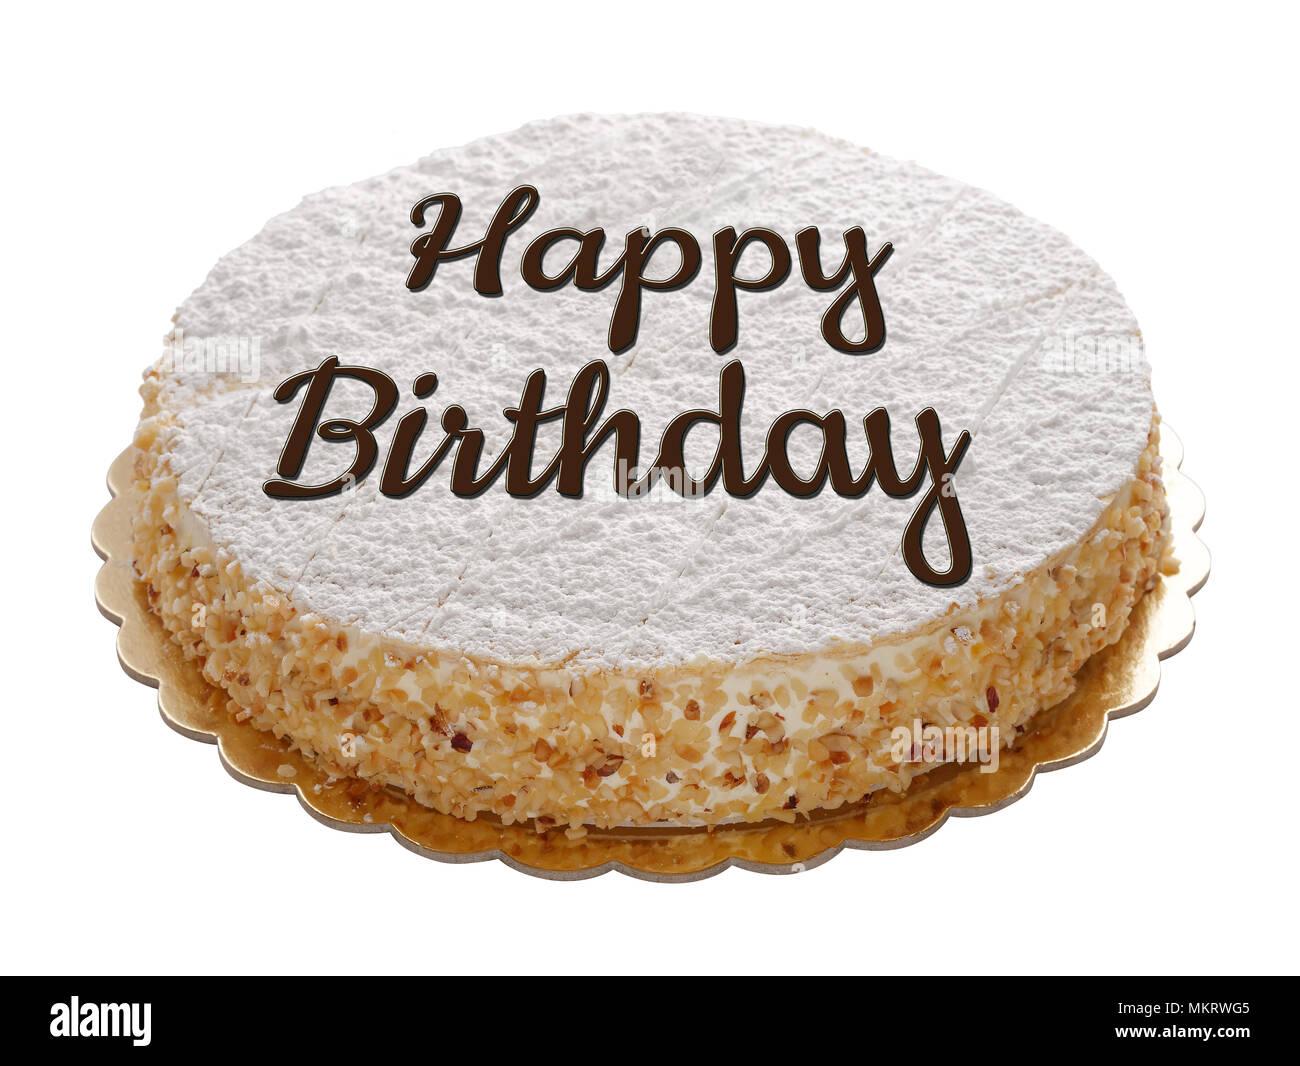 Happy Birthday Cake Isolated On White Stock Photo 184307093 Alamy